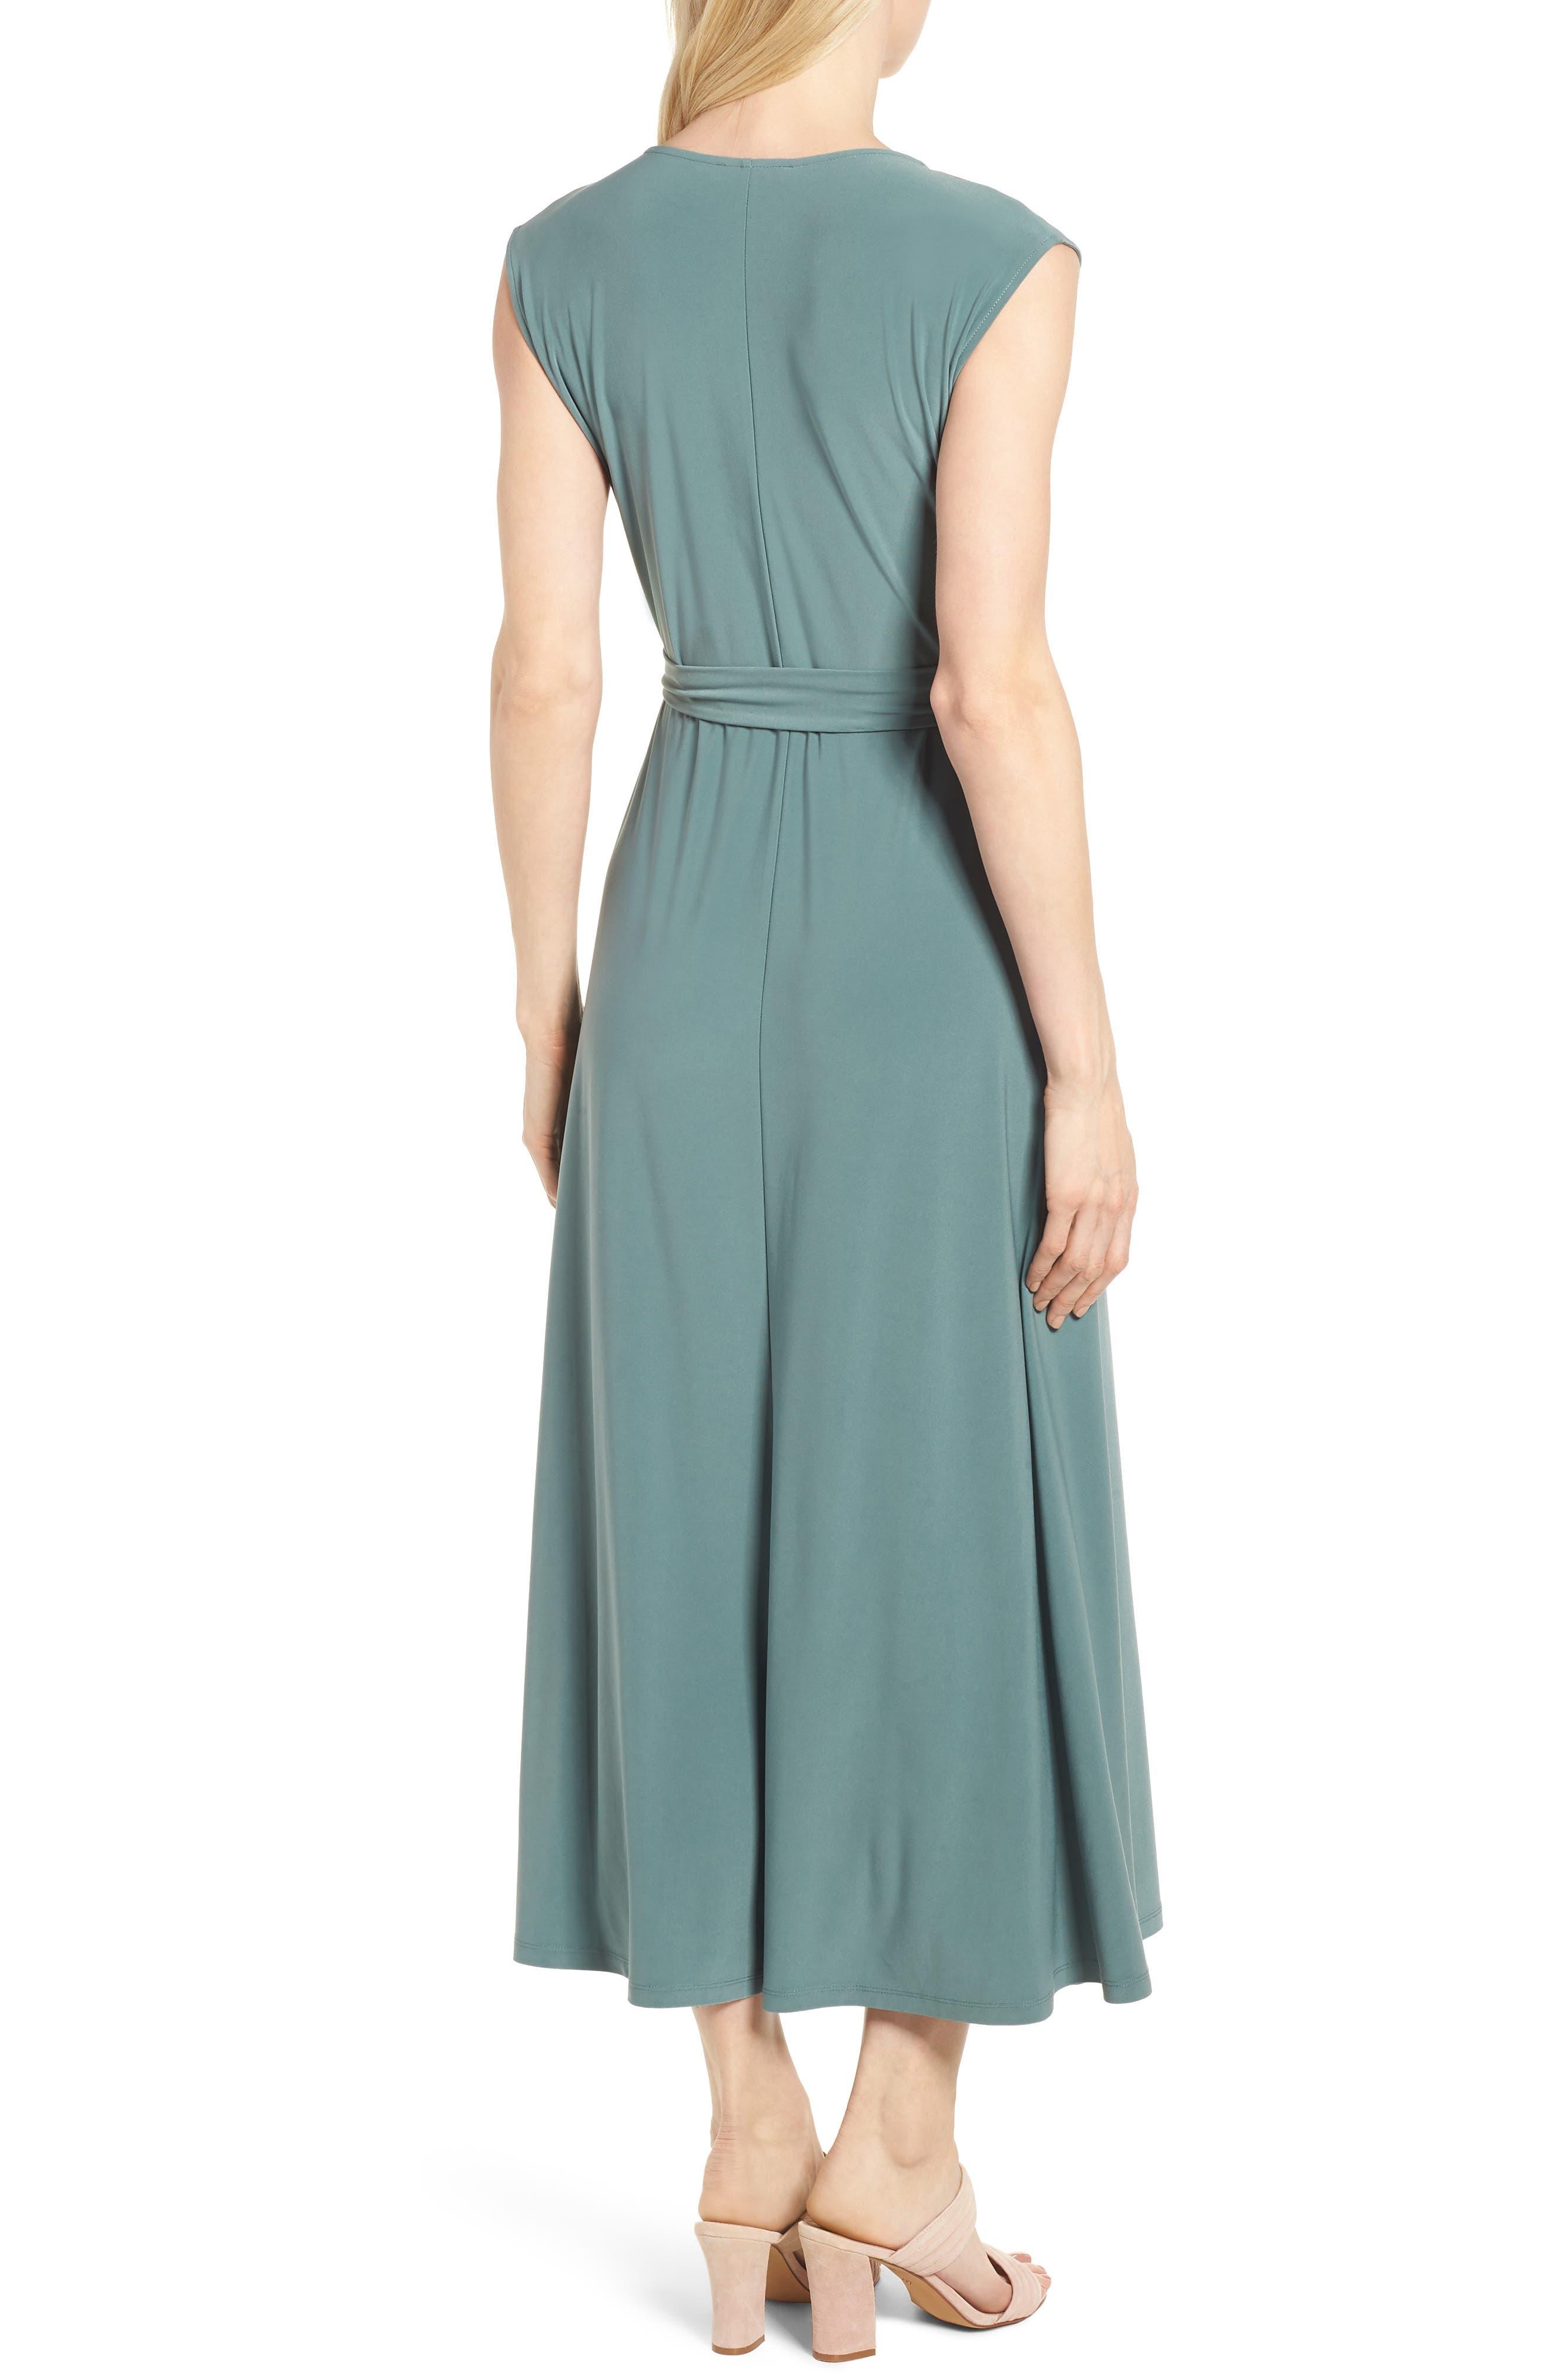 Tie Waist Maxi Dress,                             Alternate thumbnail 2, color,                             738-Tropic Moss